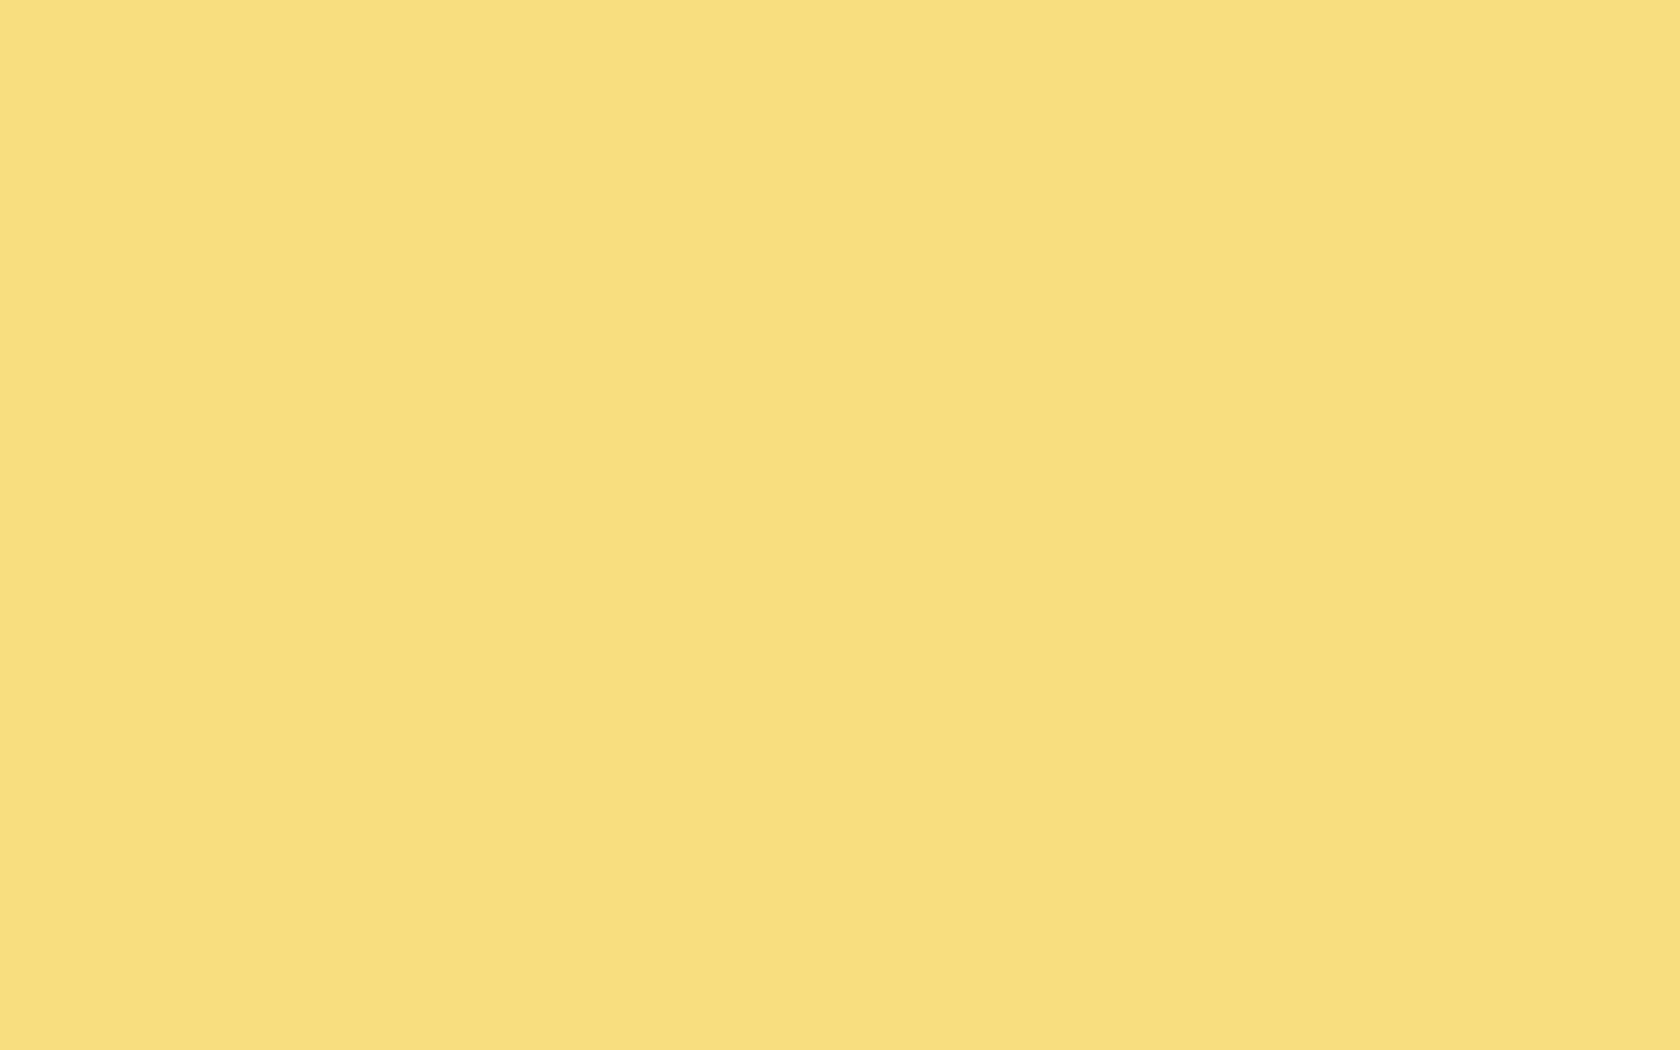 1680x1050 Jasmine Solid Color Background